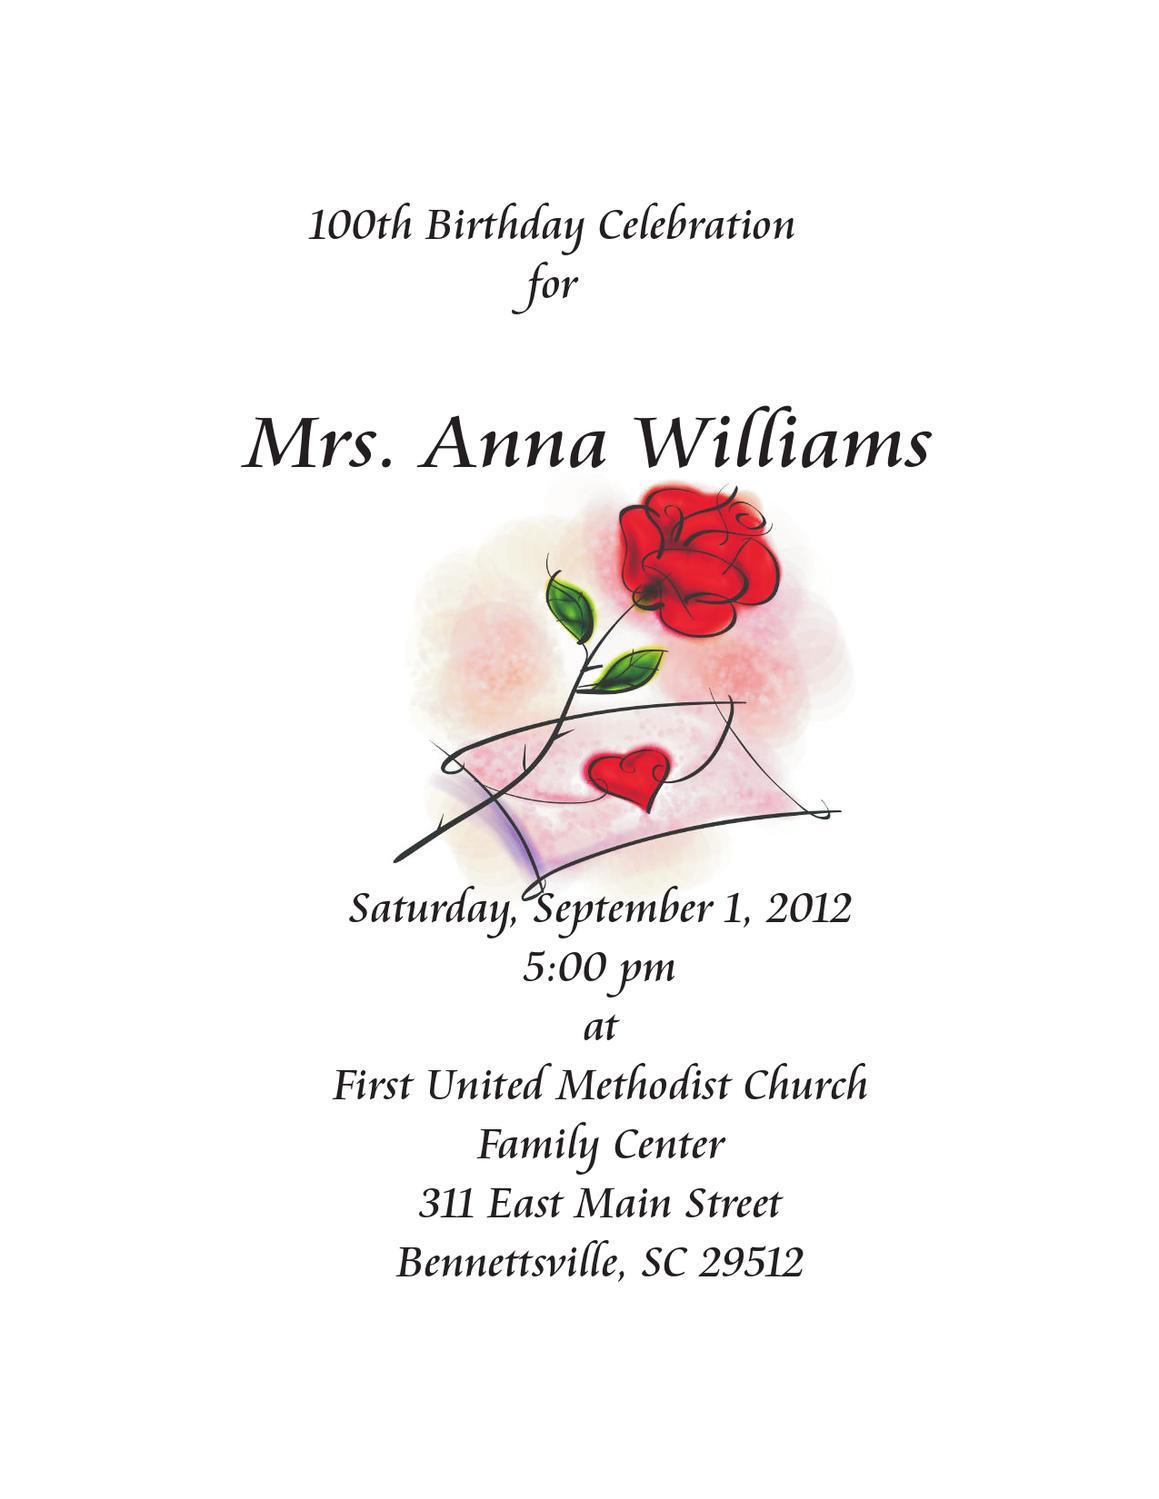 Mrs Anna Williams 100 Birthday Celebration By Cs Designs Issuu